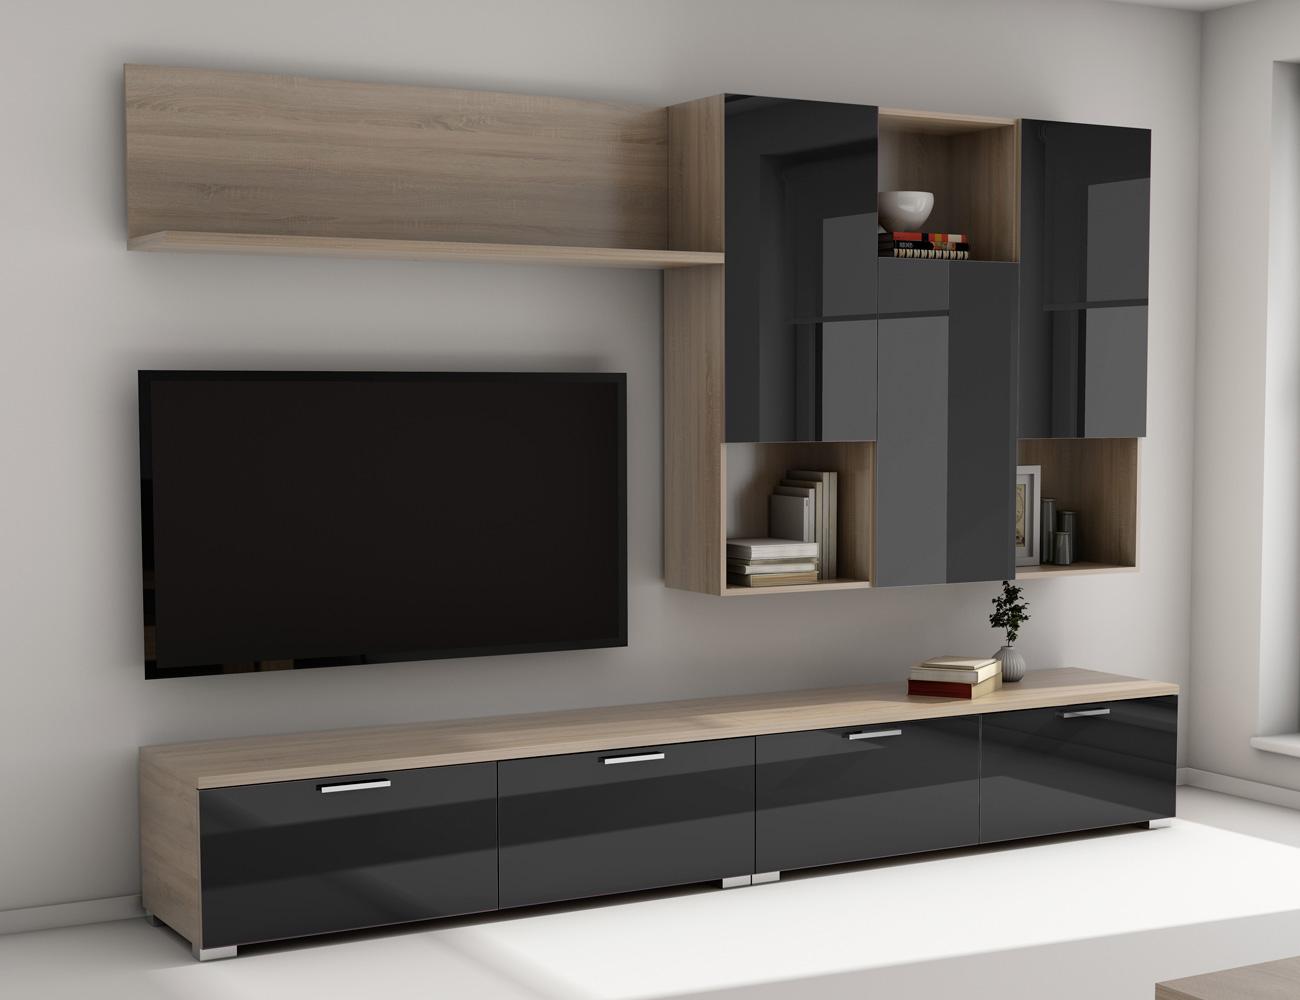 Mueble salon comedor 021 negro